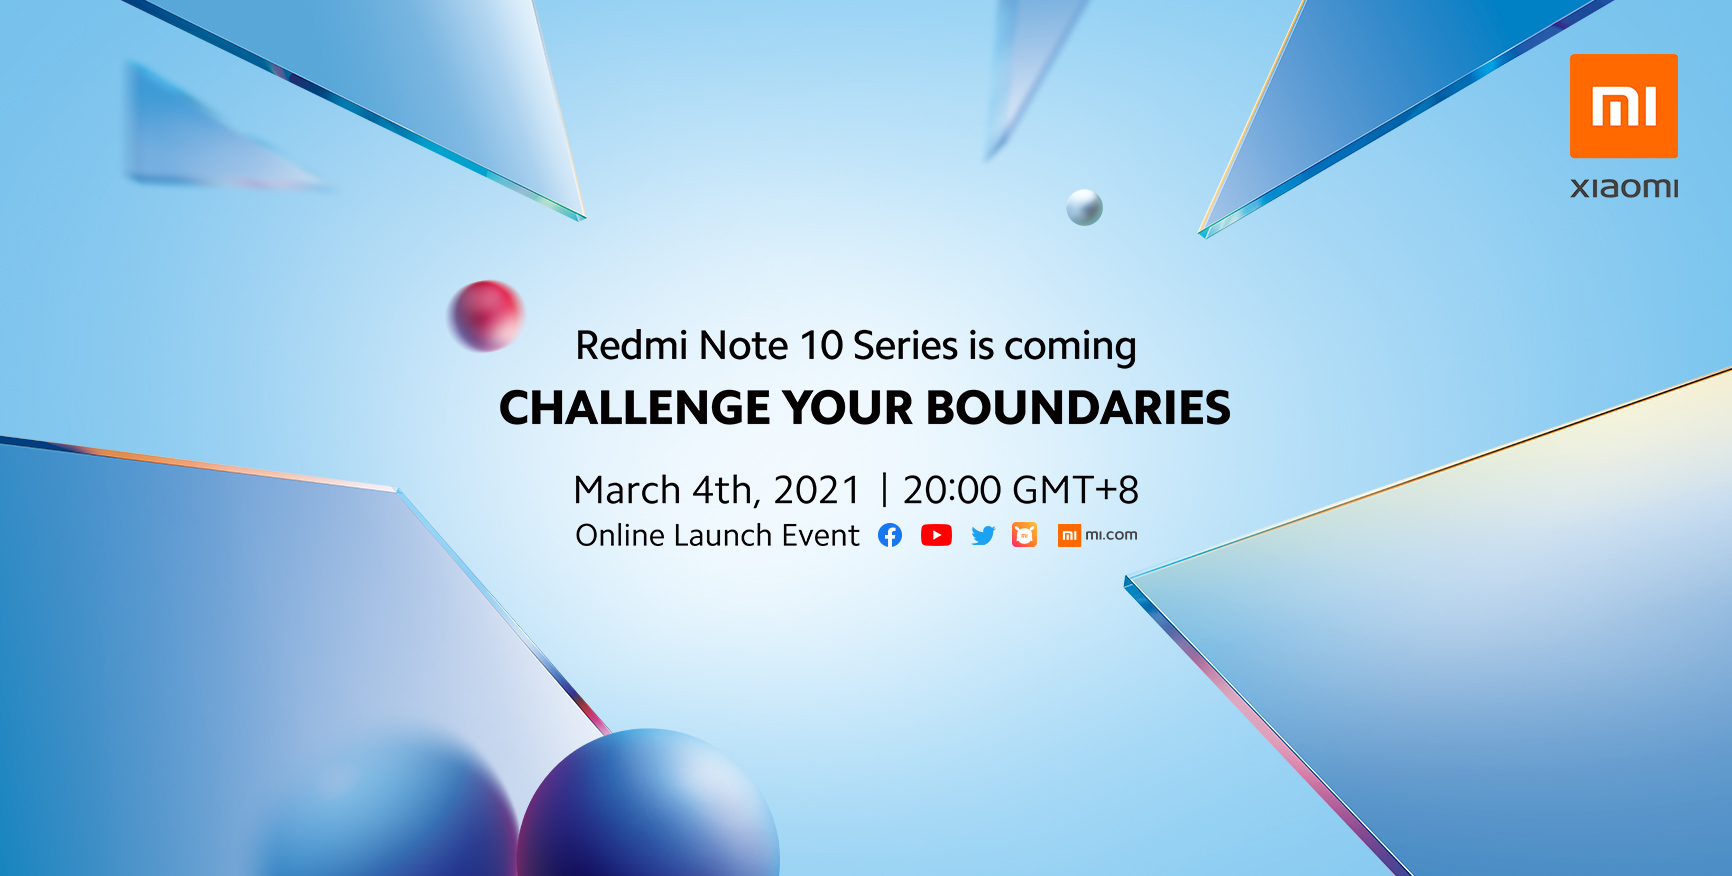 Redmi Note 10 Series Global